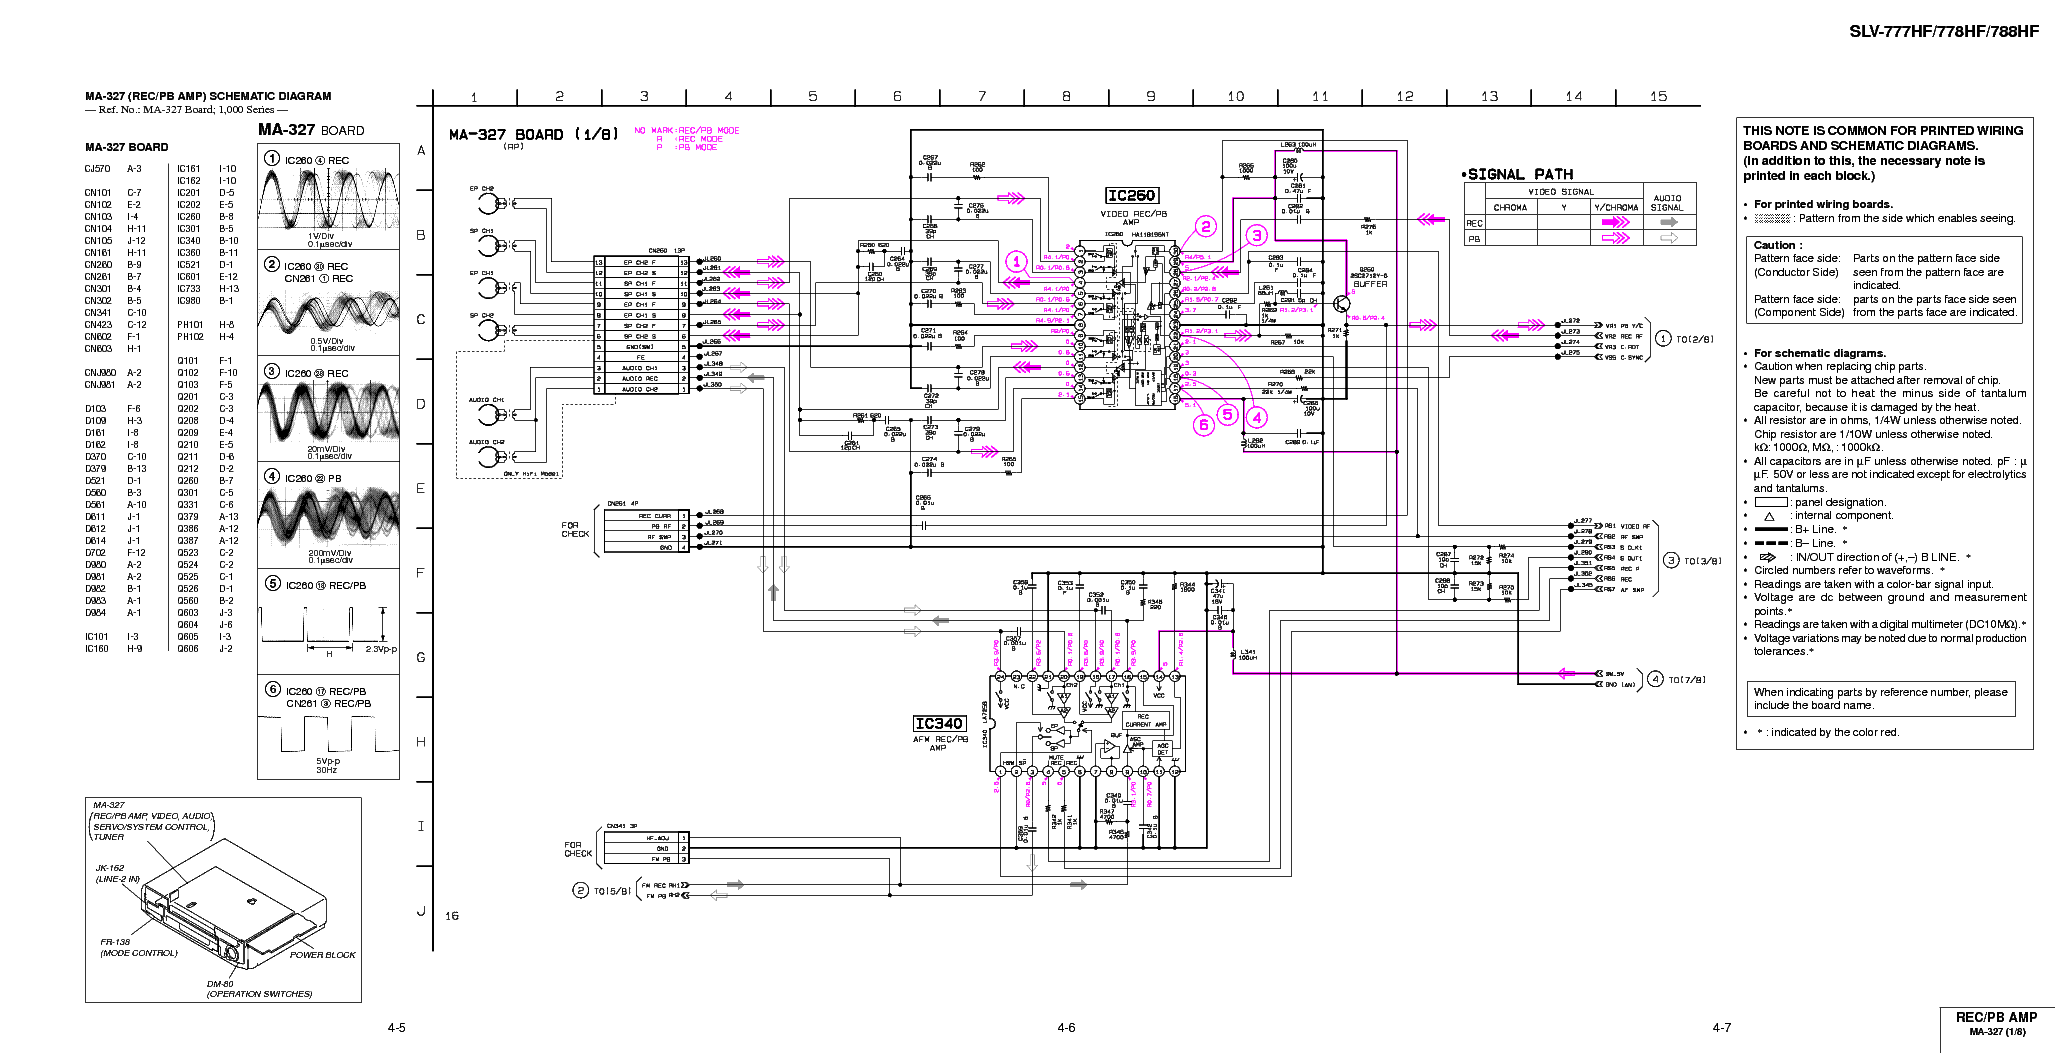 инструкция sony slv-x500sg